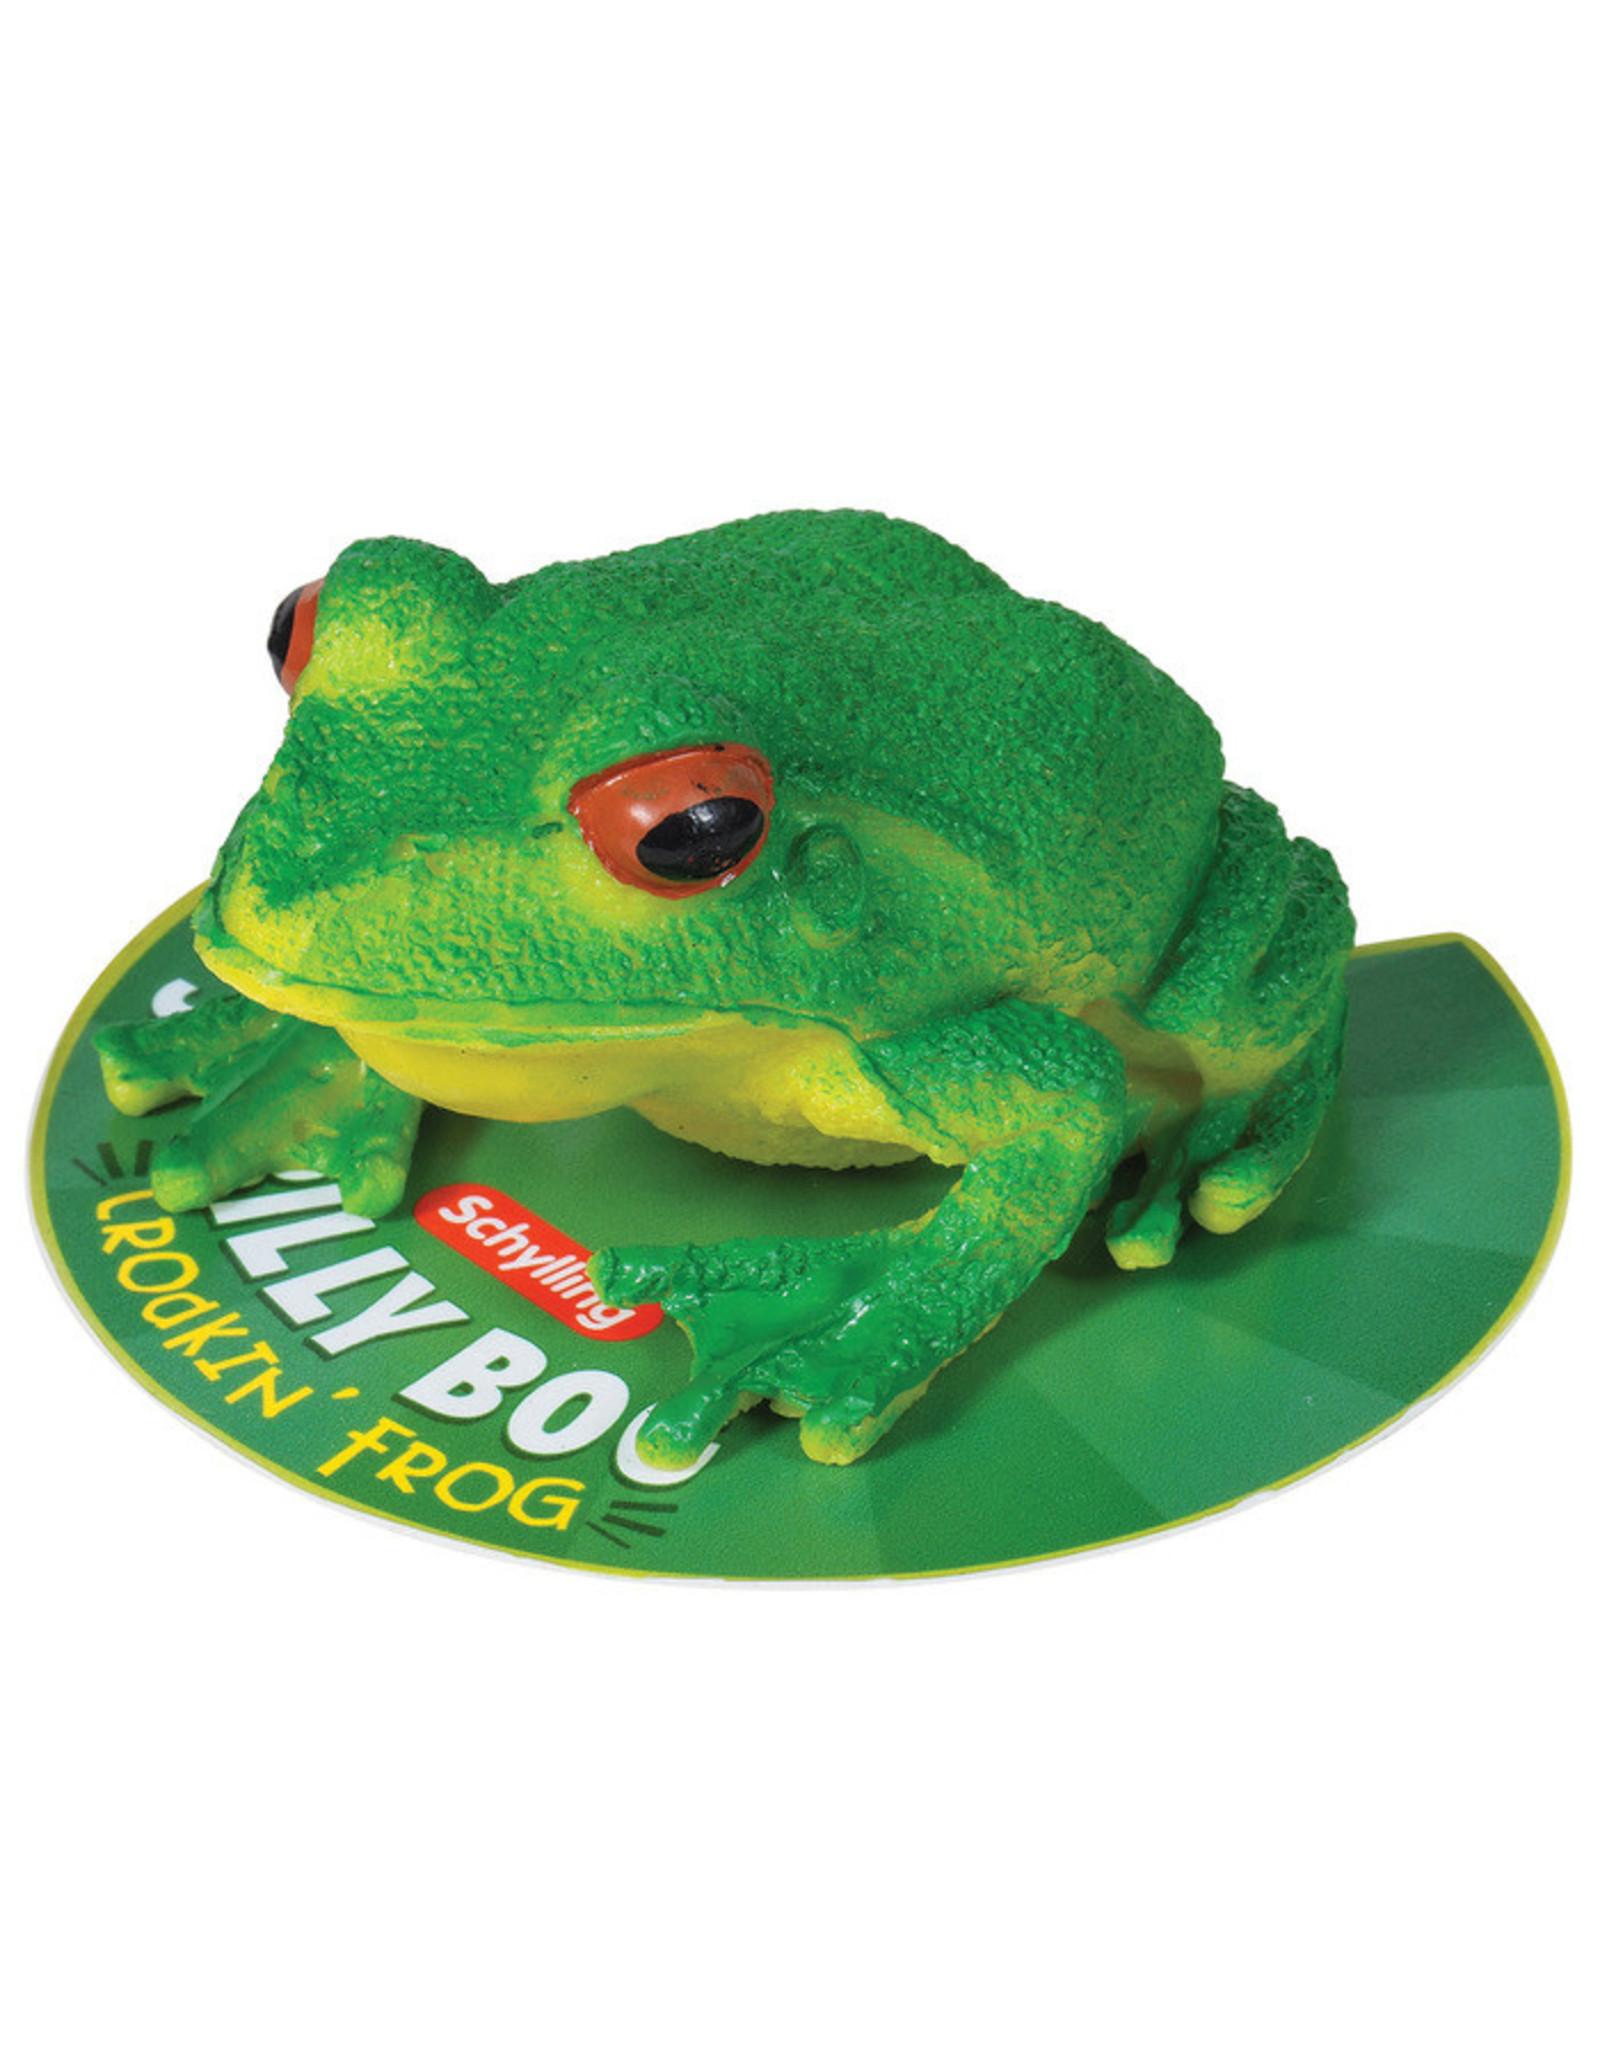 Schylling Billy Bog Squish Frog